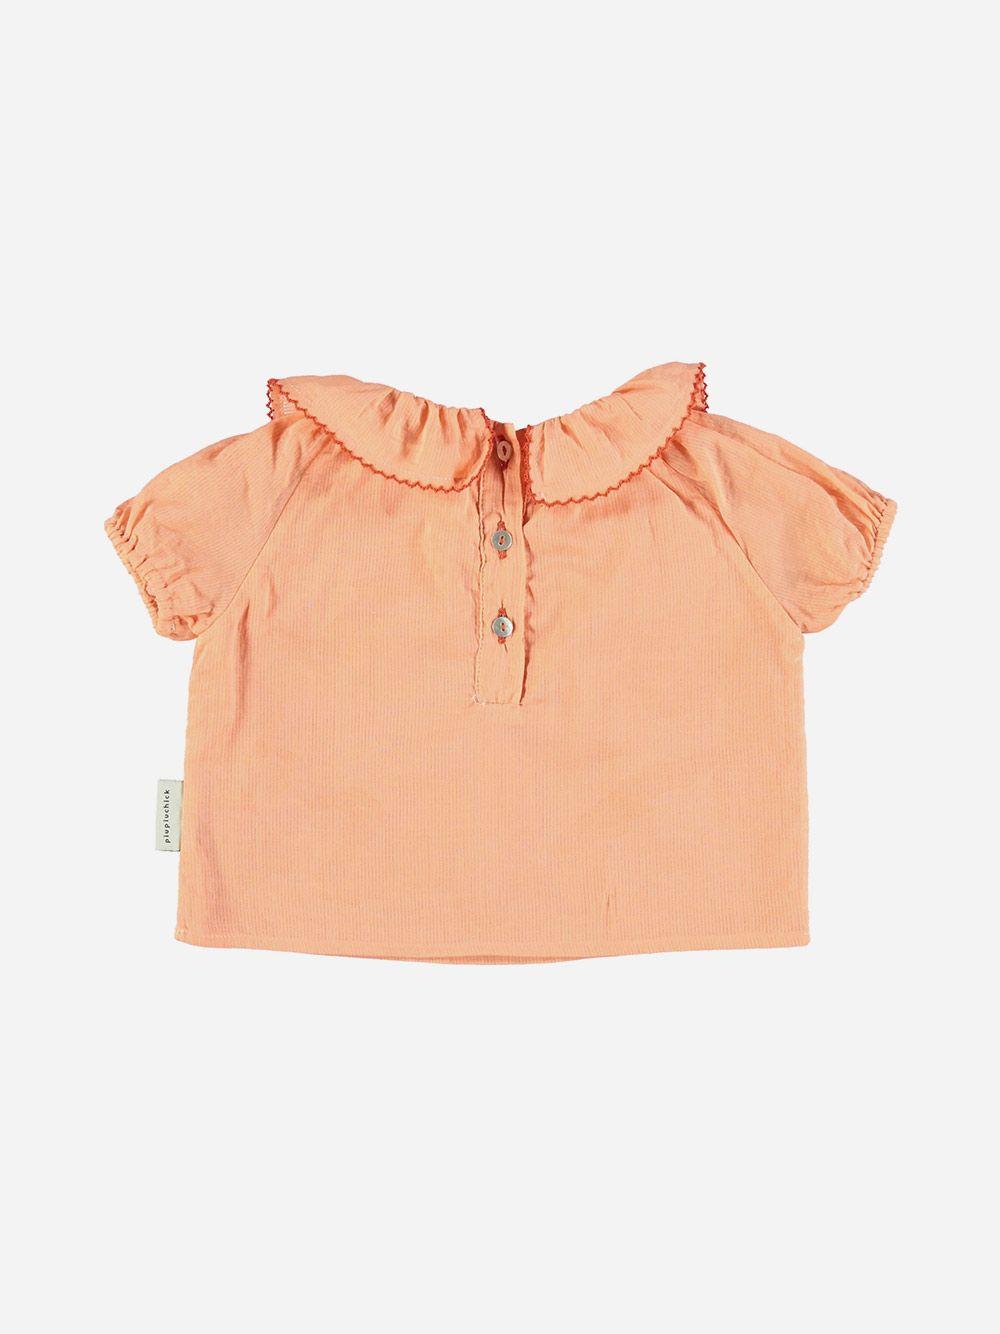 Shirt with Round Fringe Collar